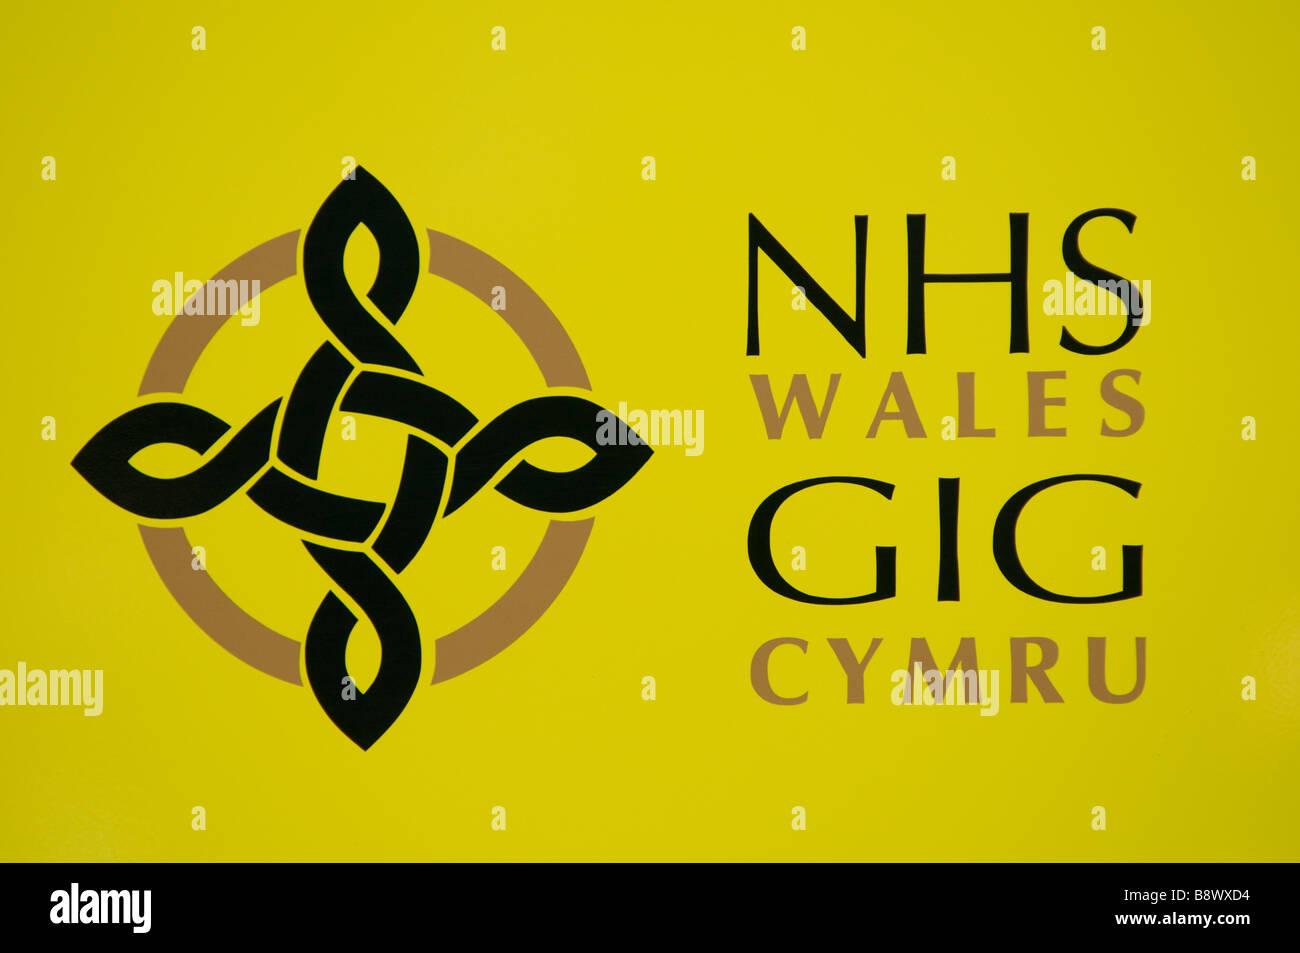 NHS National Health Service wales welsh logo bilingual sign - Stock Image